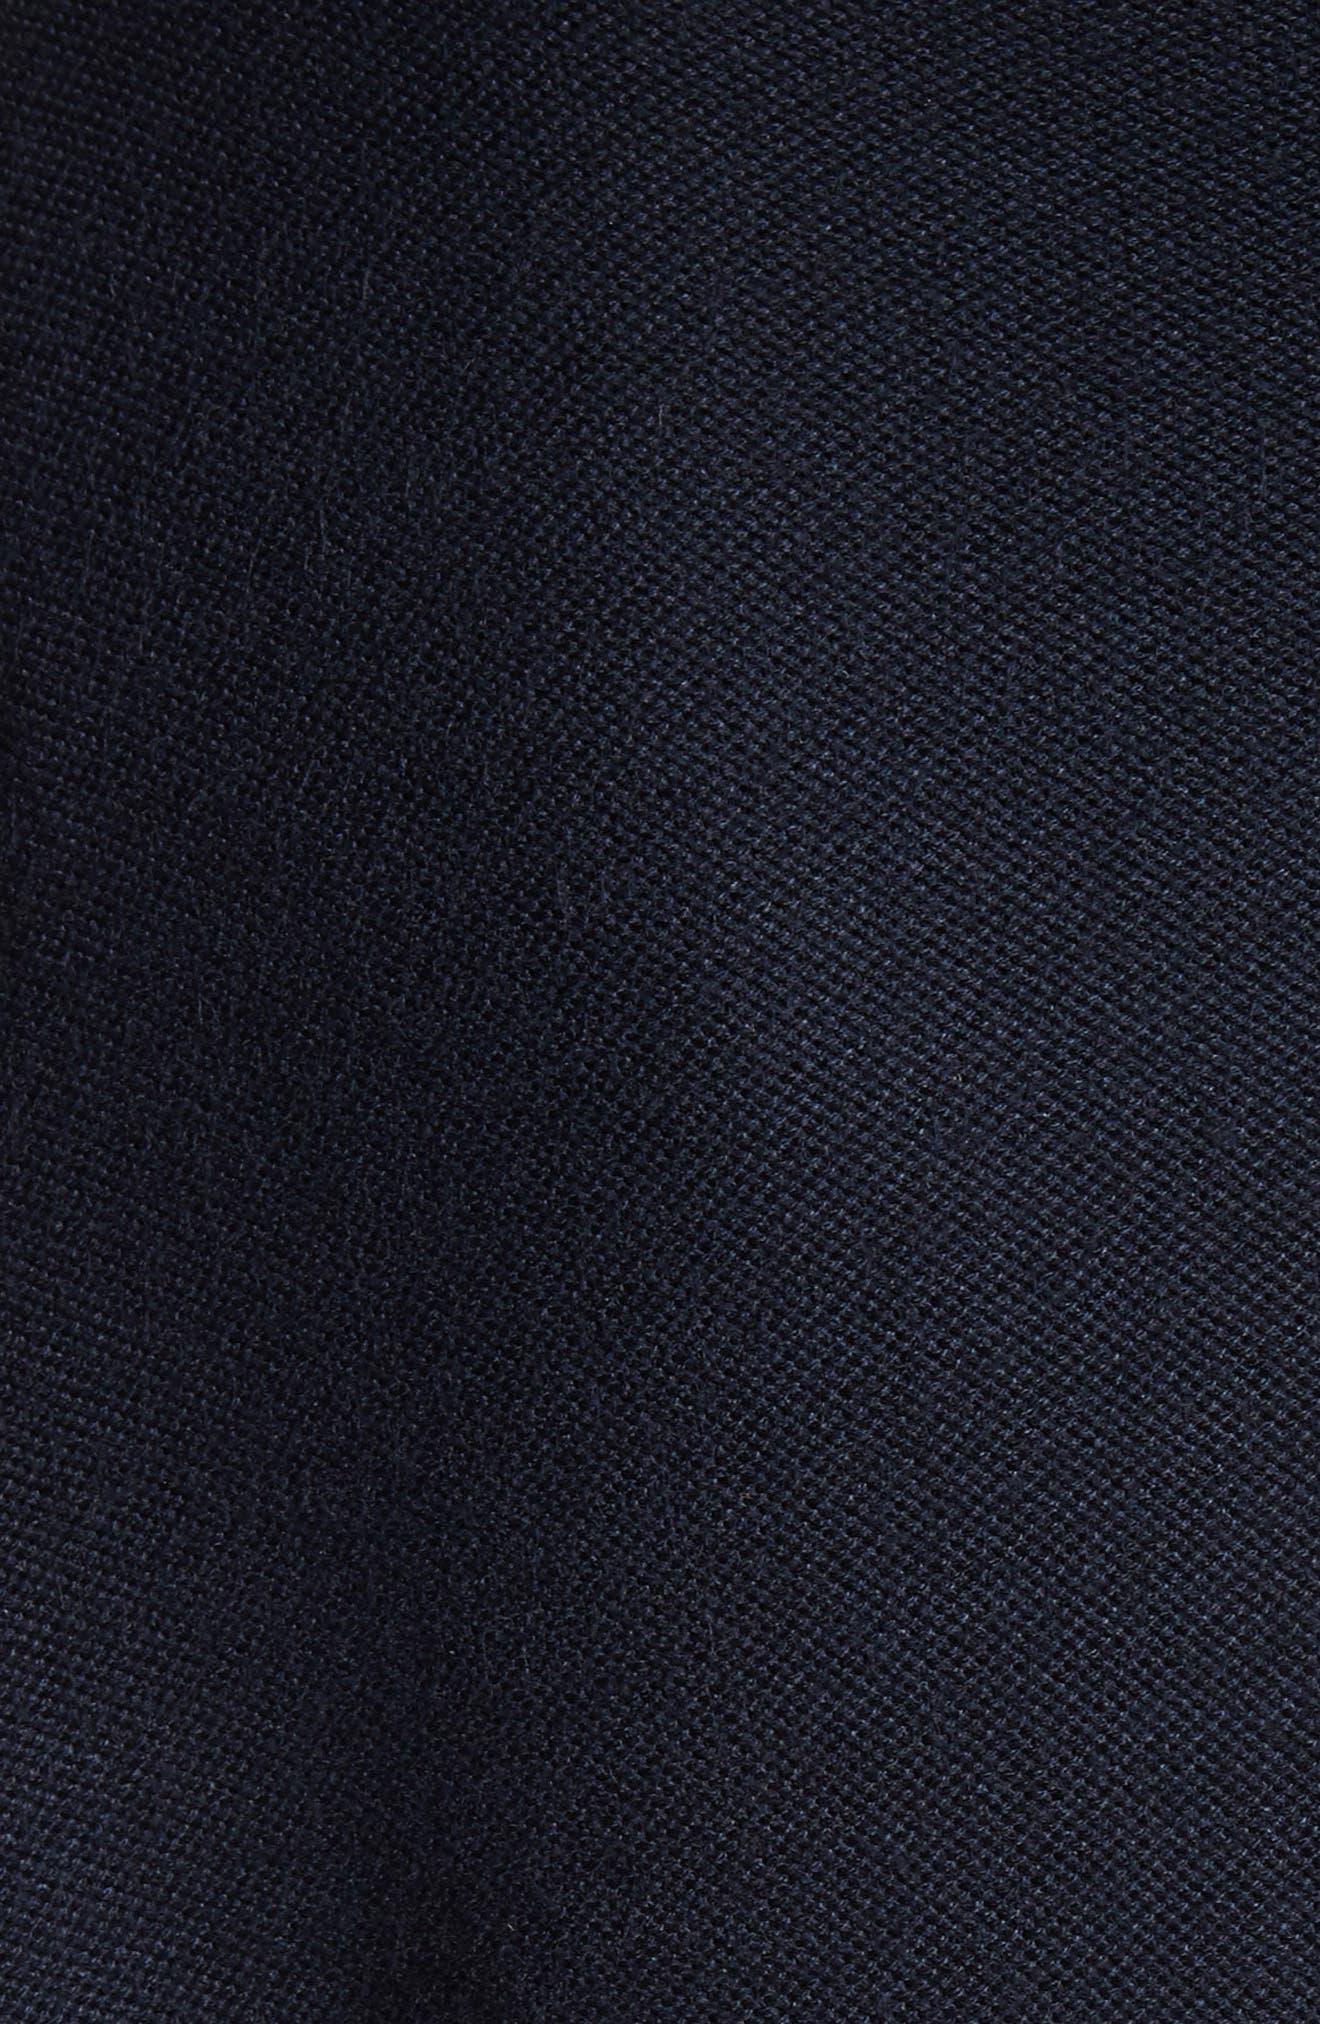 Alternate Image 5  - St. John Collection Hand Beaded Birdseye Knit Cardigan